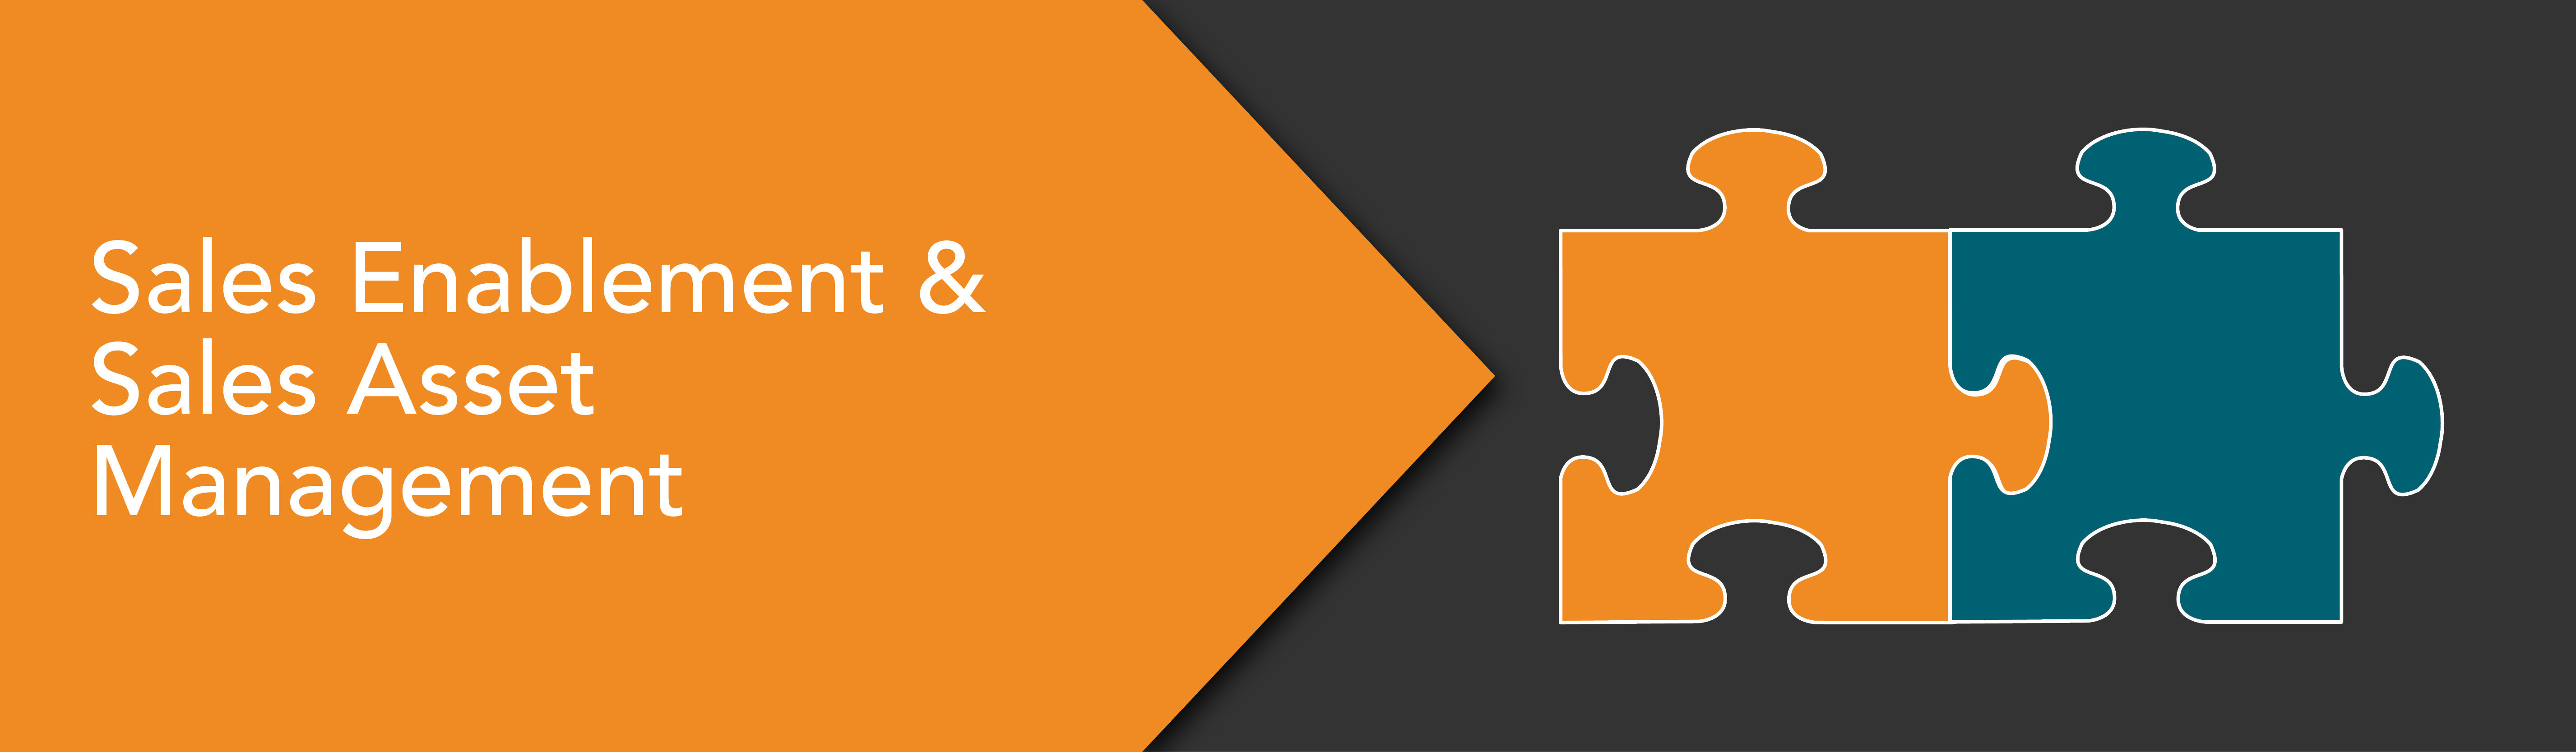 Sales Enablement and Sales Asset Management